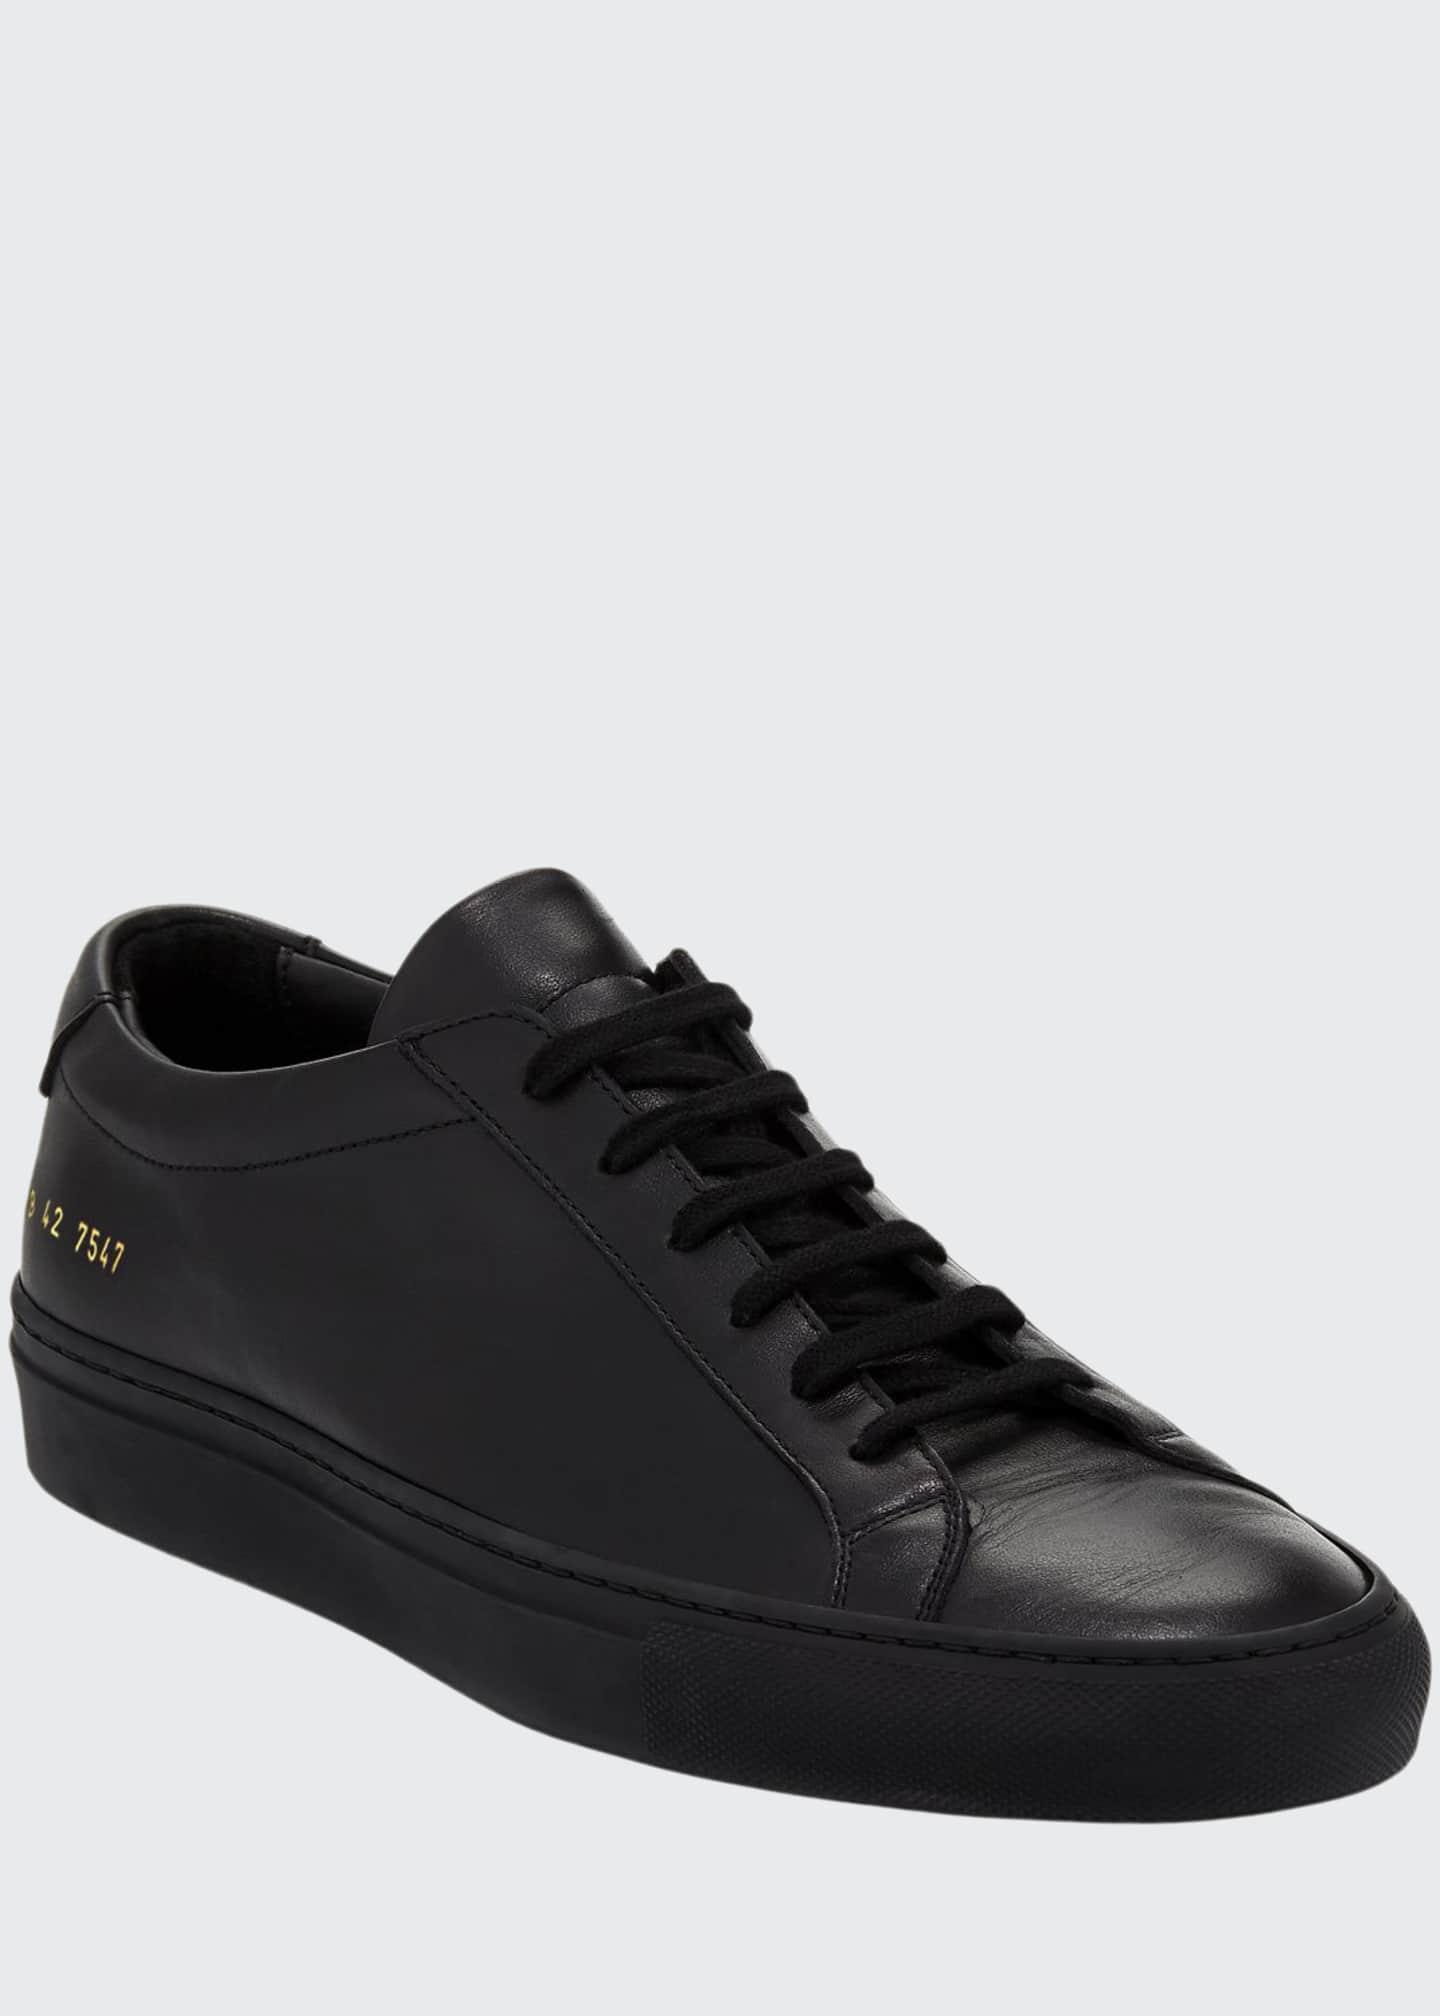 Common Projects Men's Achilles Low-Top Sneakers, Black